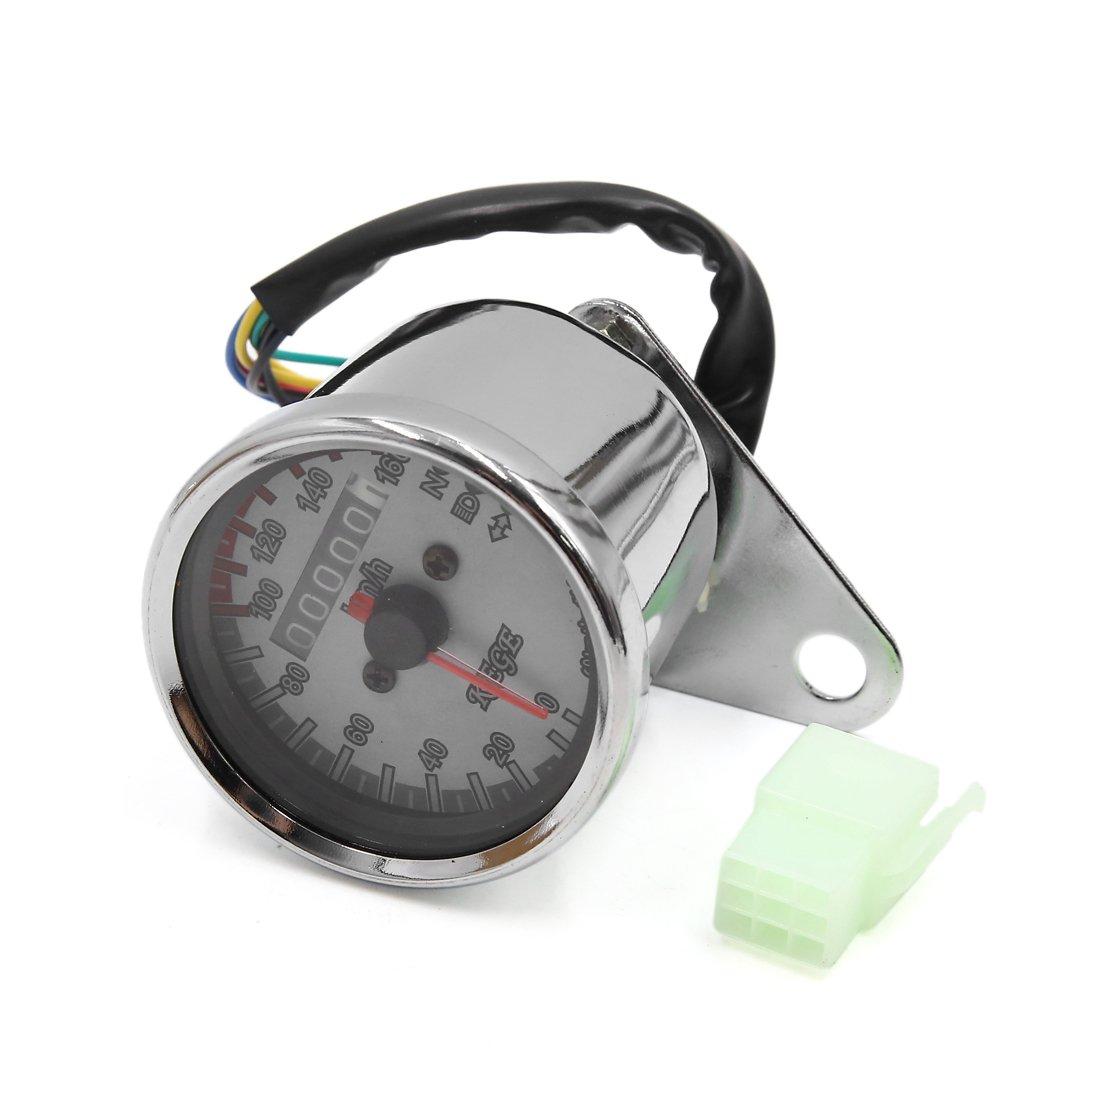 uxcell Universal Silver Tone Motorcycle 0-160Km/h Odometer Tachometer Speedometer Gauge